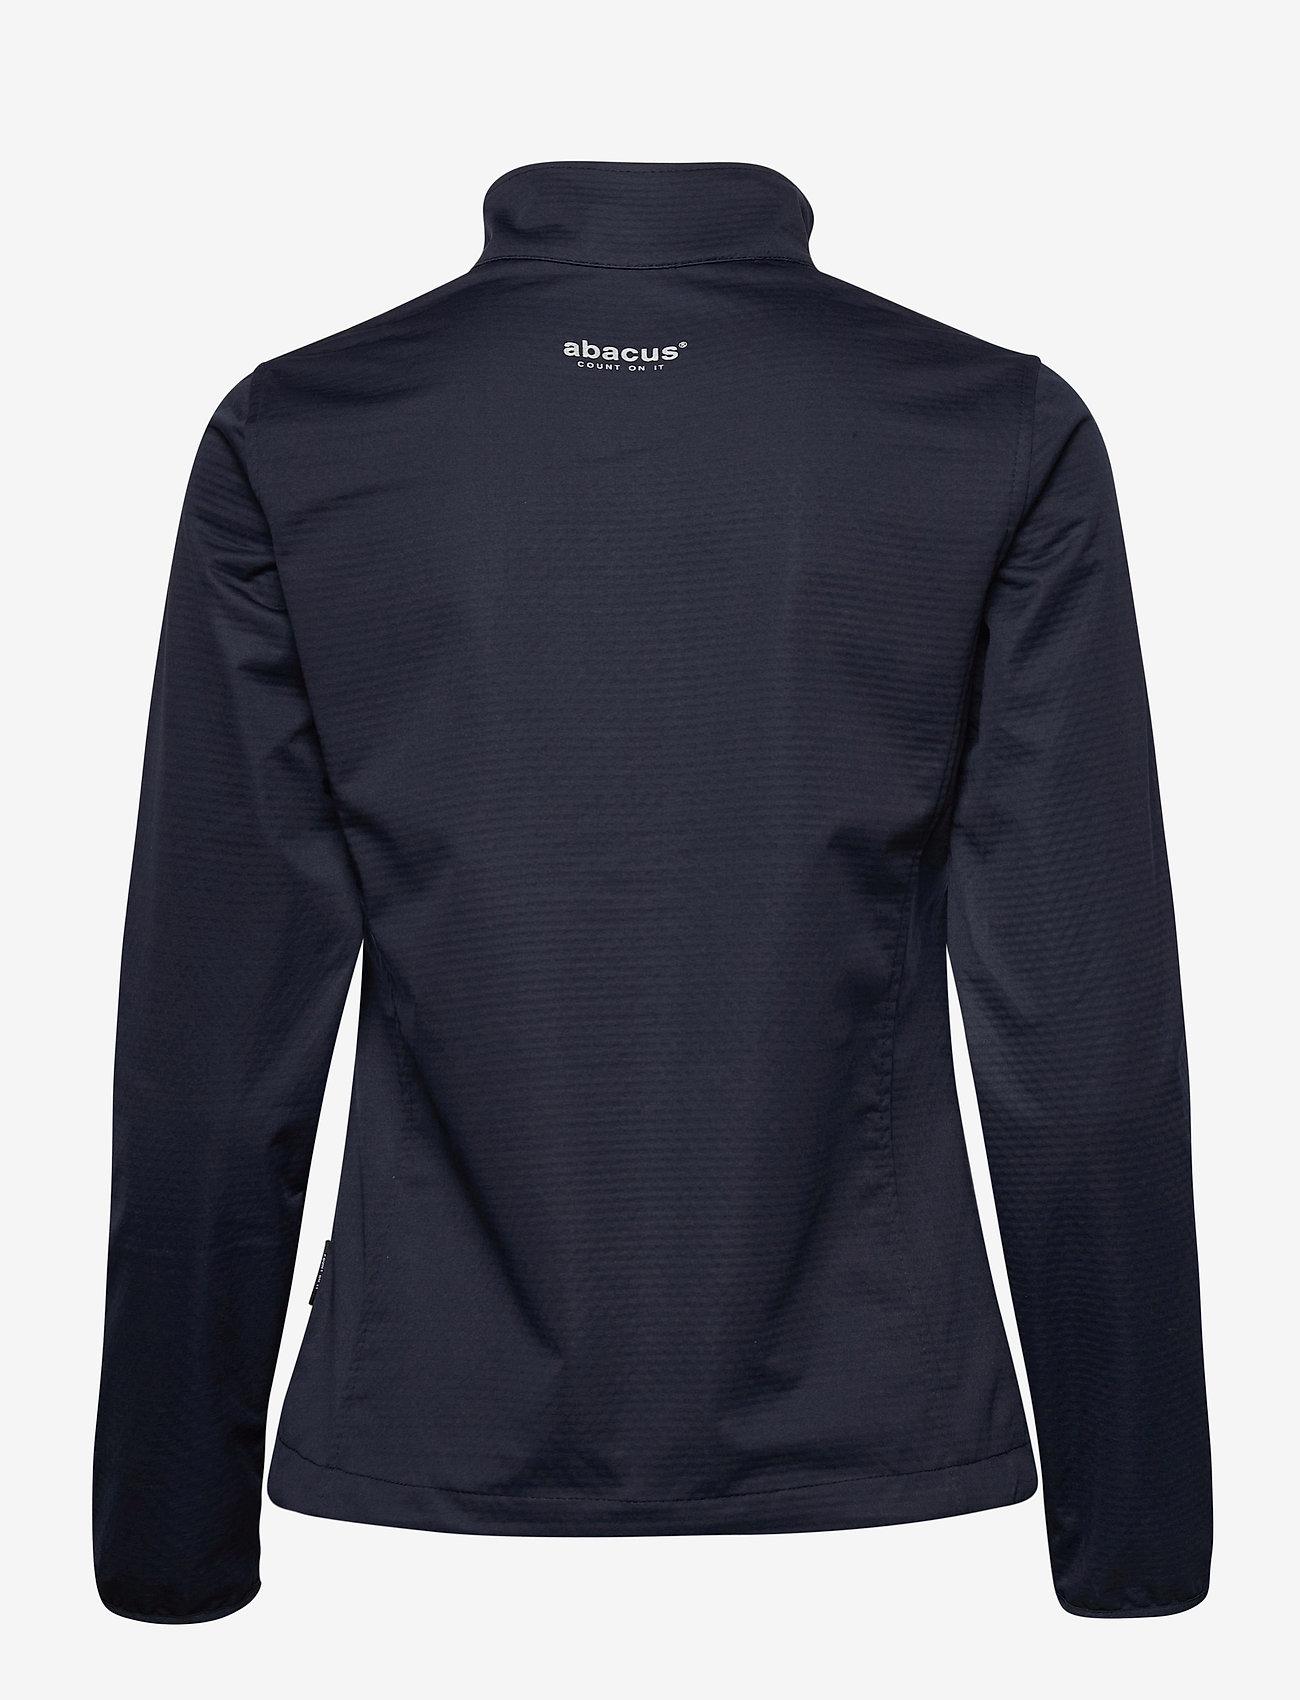 Abacus - Lds Lytham softshell jacket - golf jassen - navy - 1